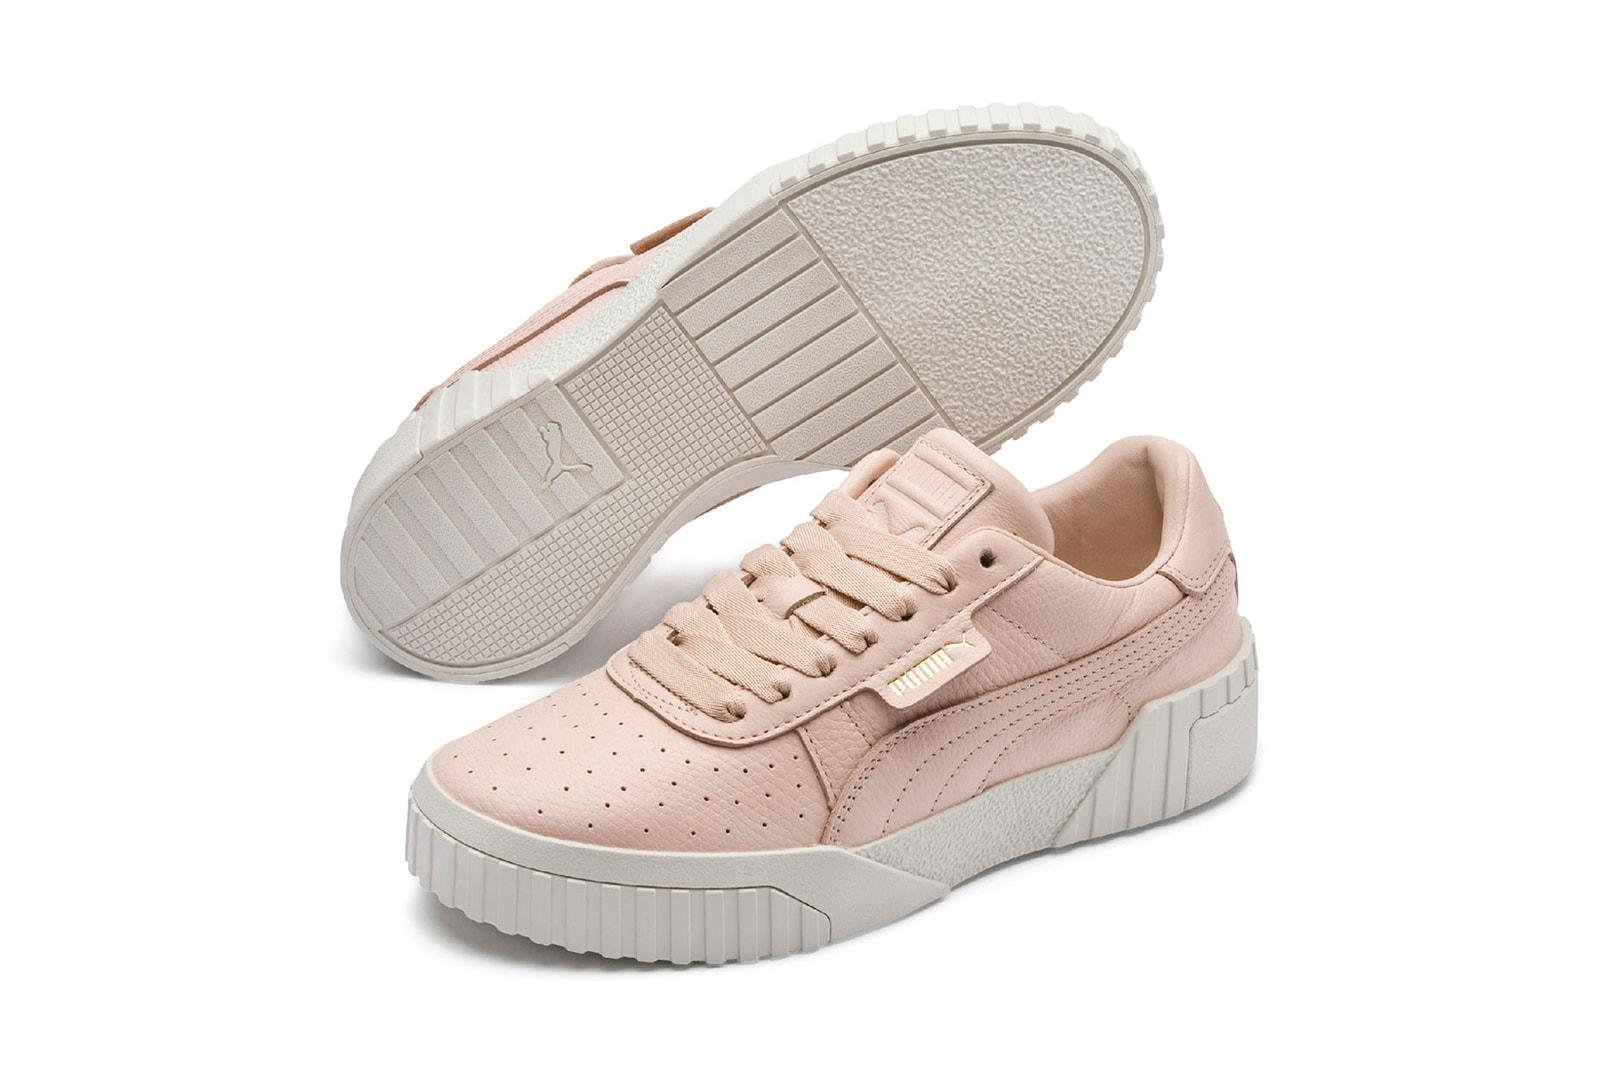 437c211c5659 PUMA Releases Women s Cali Sneaker Silhouette